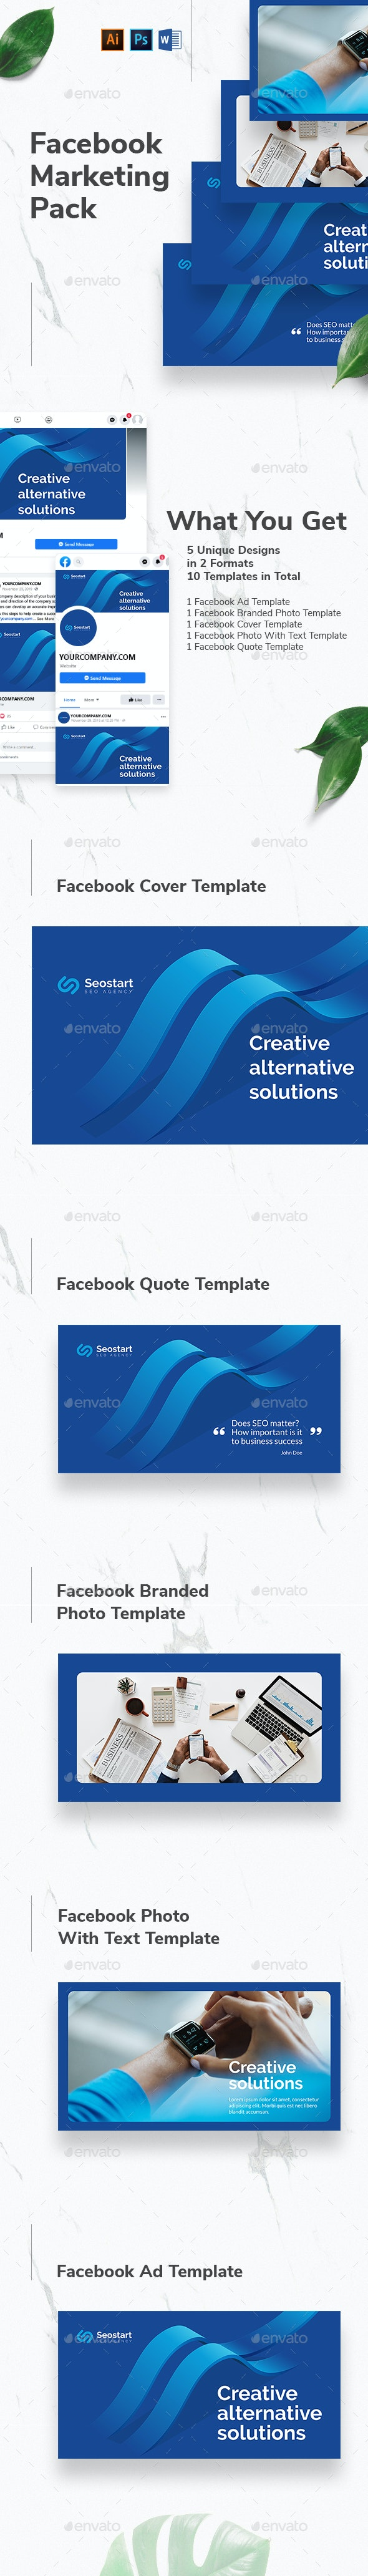 SEO Agency Facebook Marketing Materials - Facebook Timeline Covers Social Media